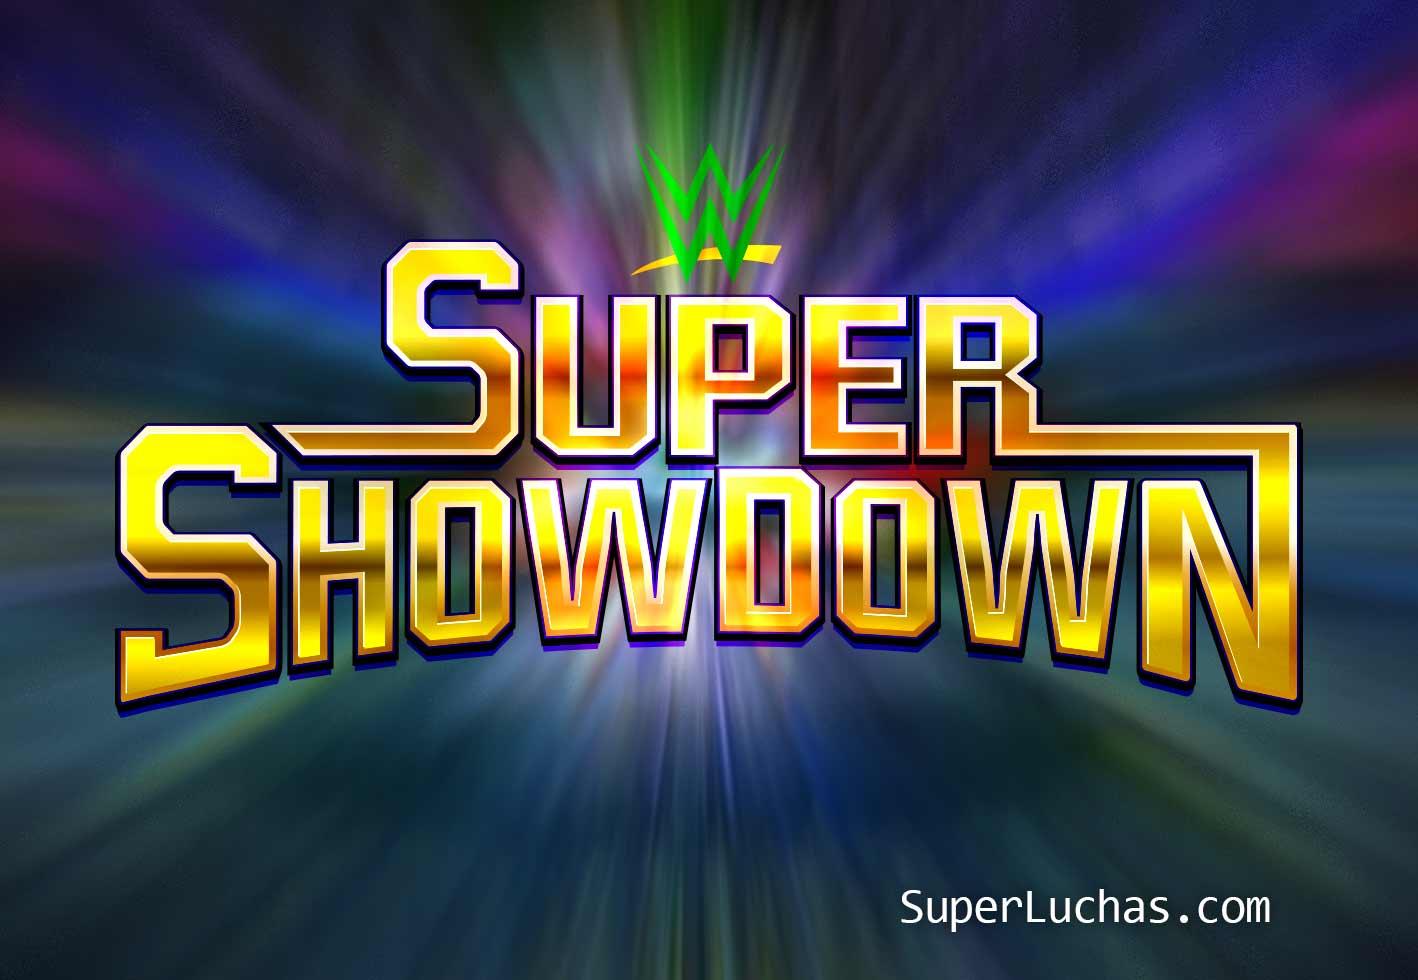 Sorpresas en Super ShowDown 2020